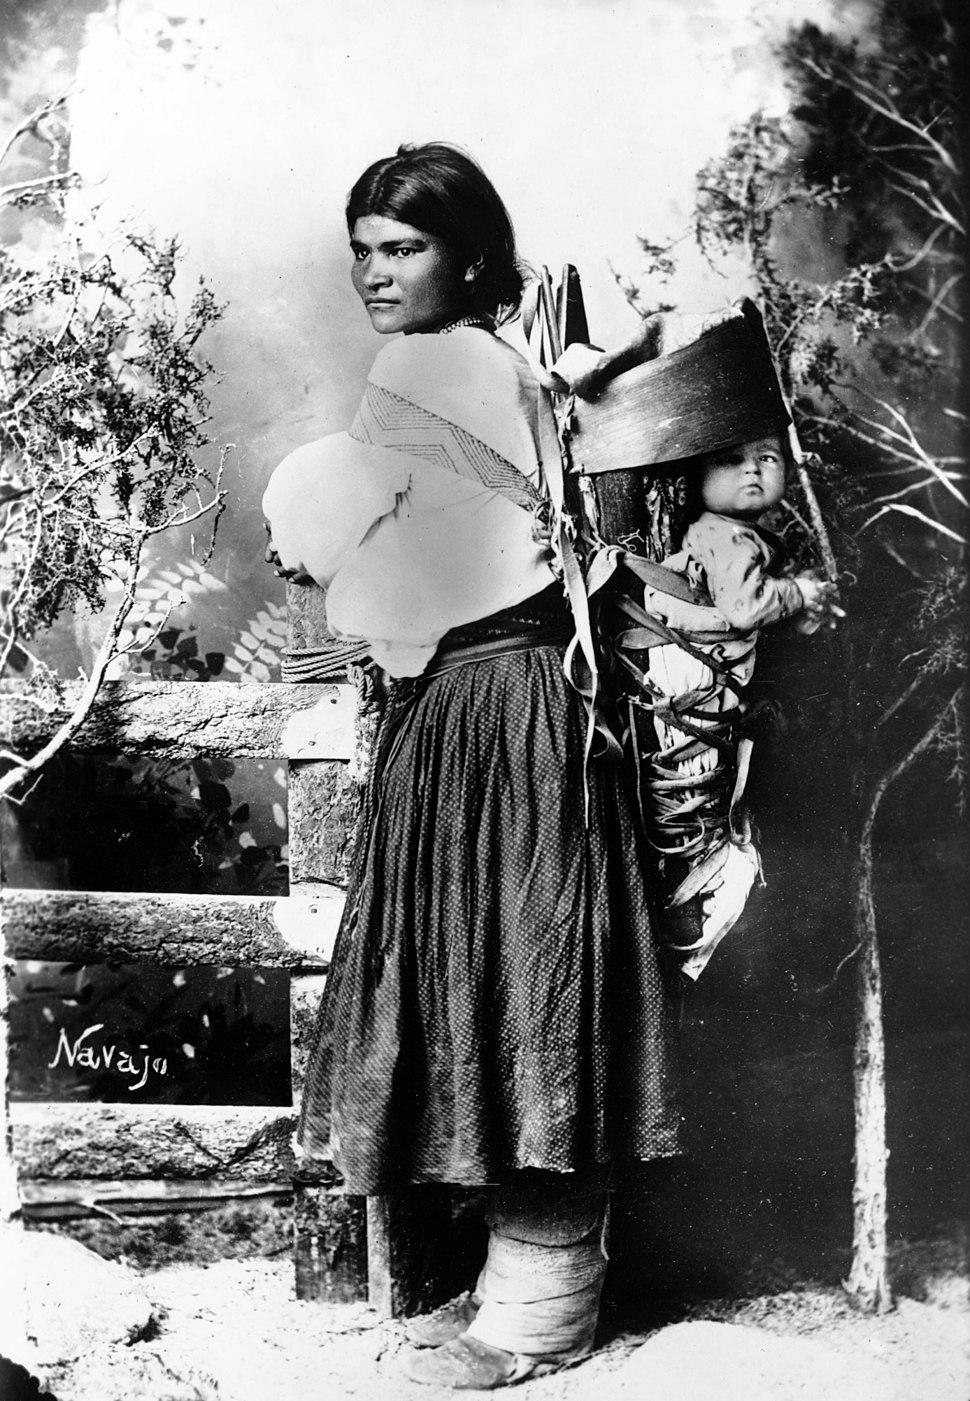 Navajo woman & child